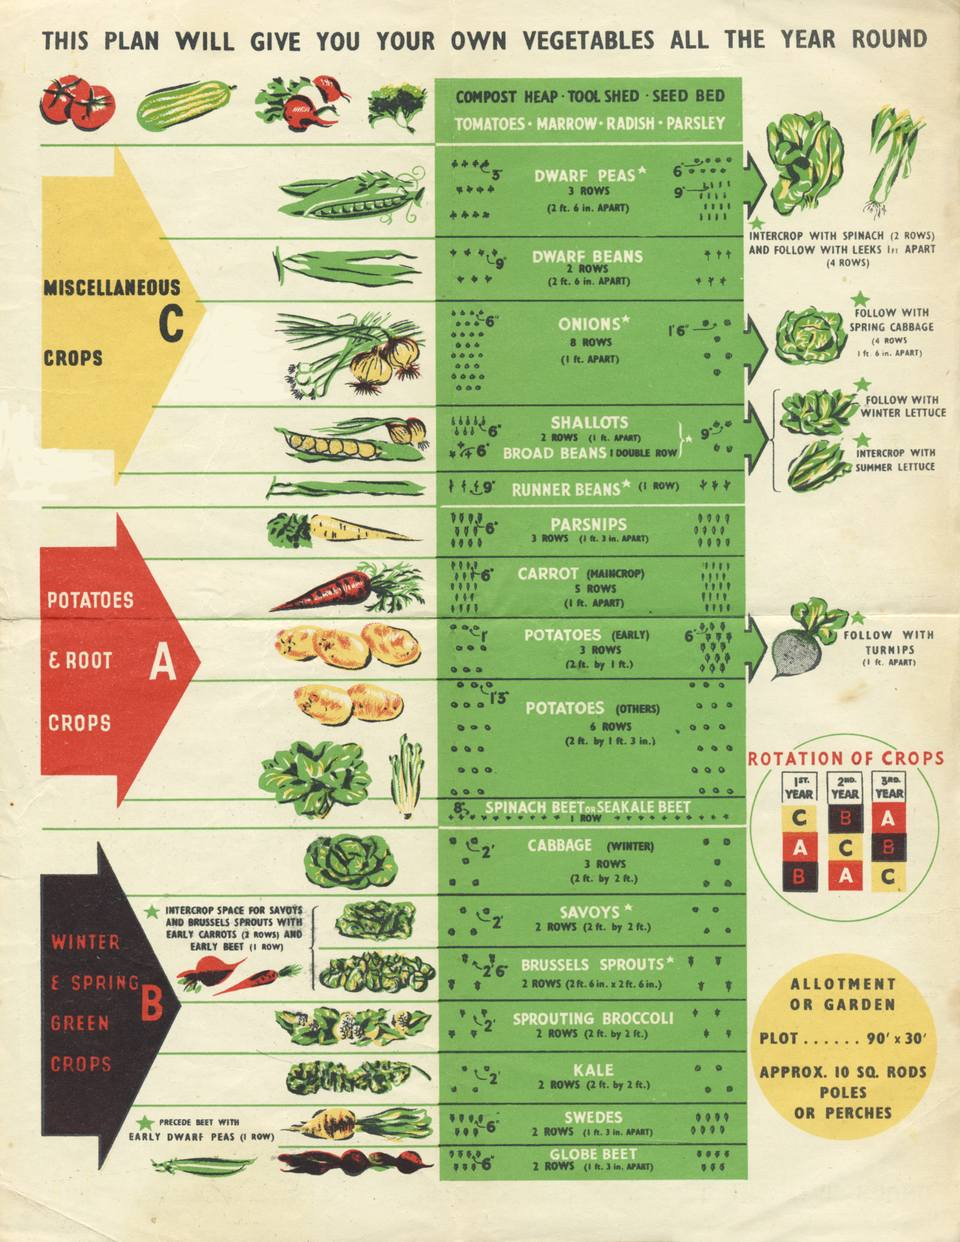 medium resolution of crop rotation the three year crop rotation plan